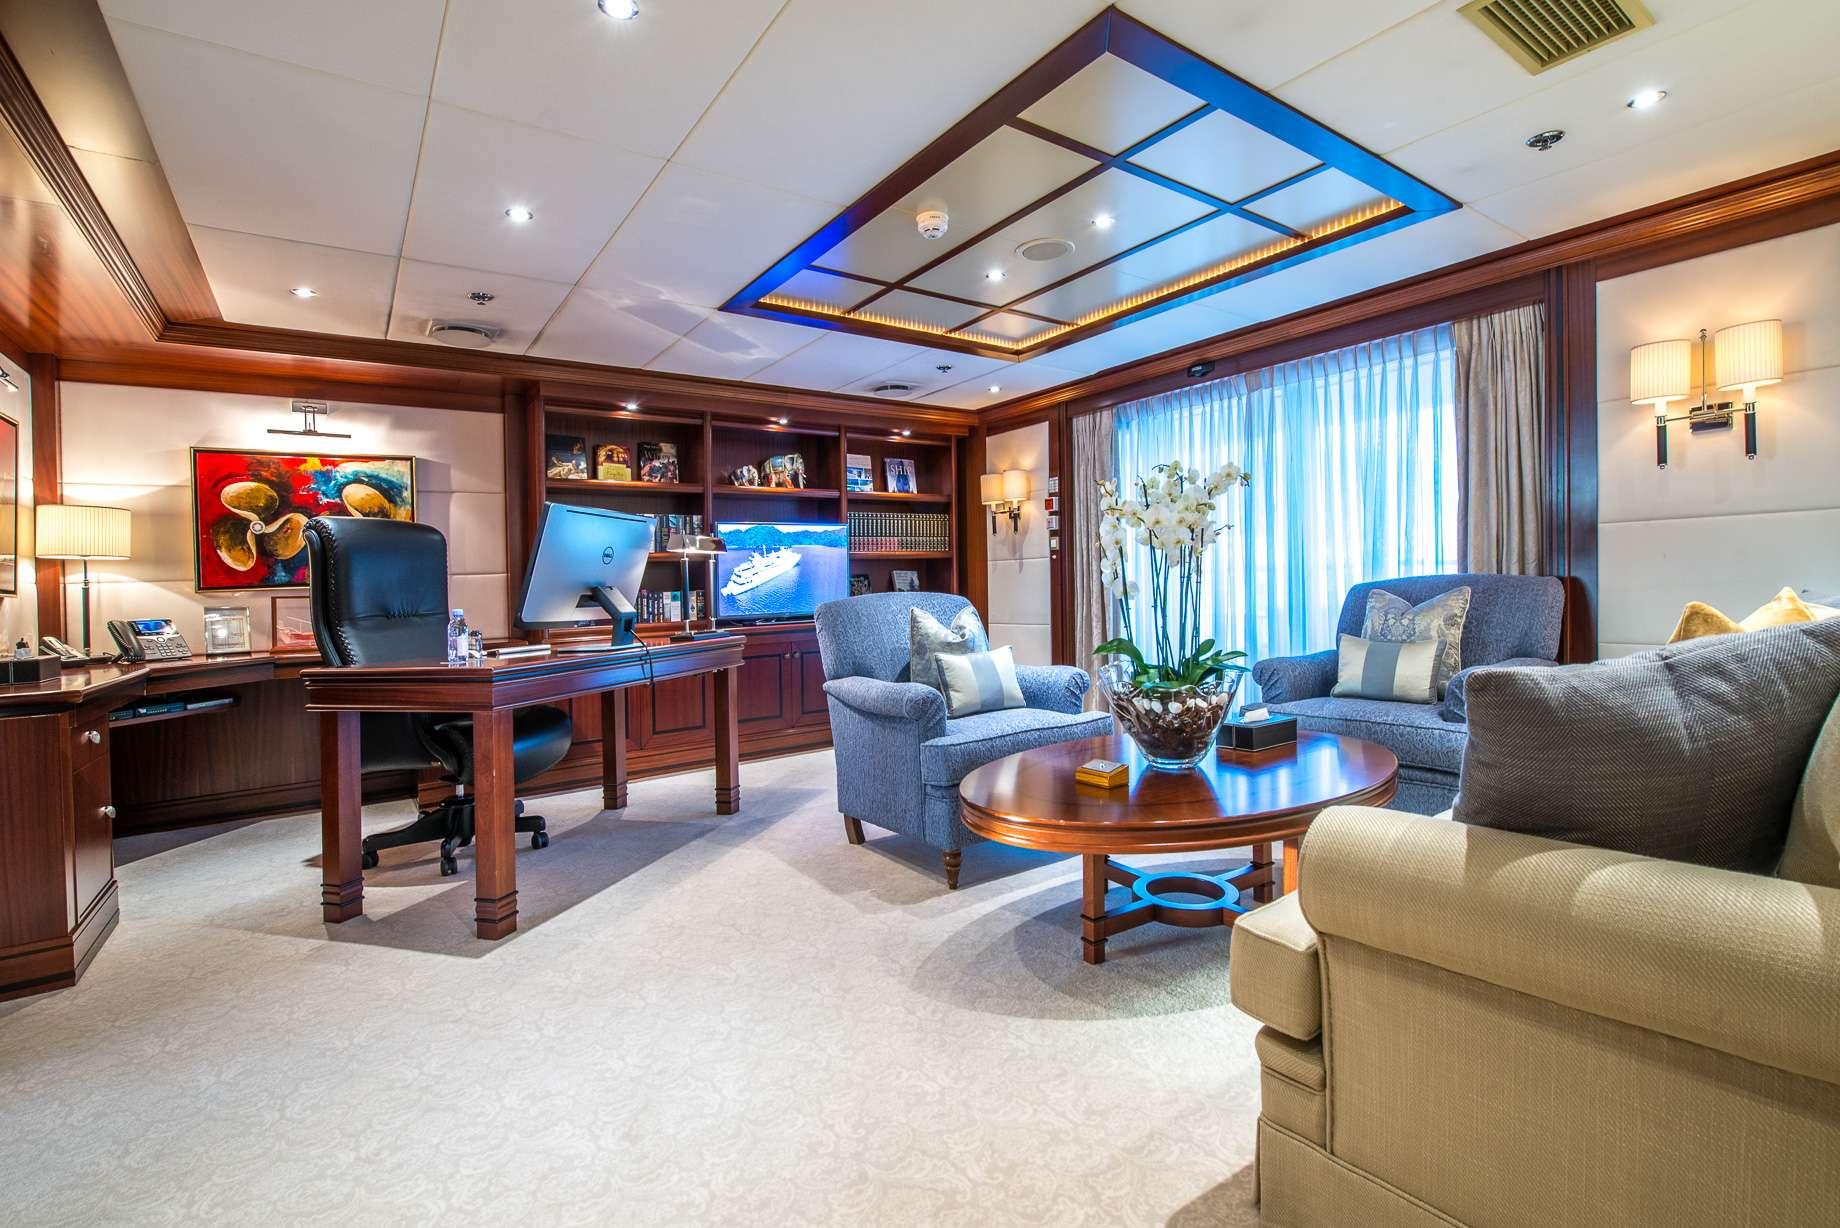 Motor Yacht 'LAUREN L' Master Salon, 40 PAX, 295.00 Ft, 90.00 Meters, Built 2002, Cassens Werft, Refit Year 2008/2015